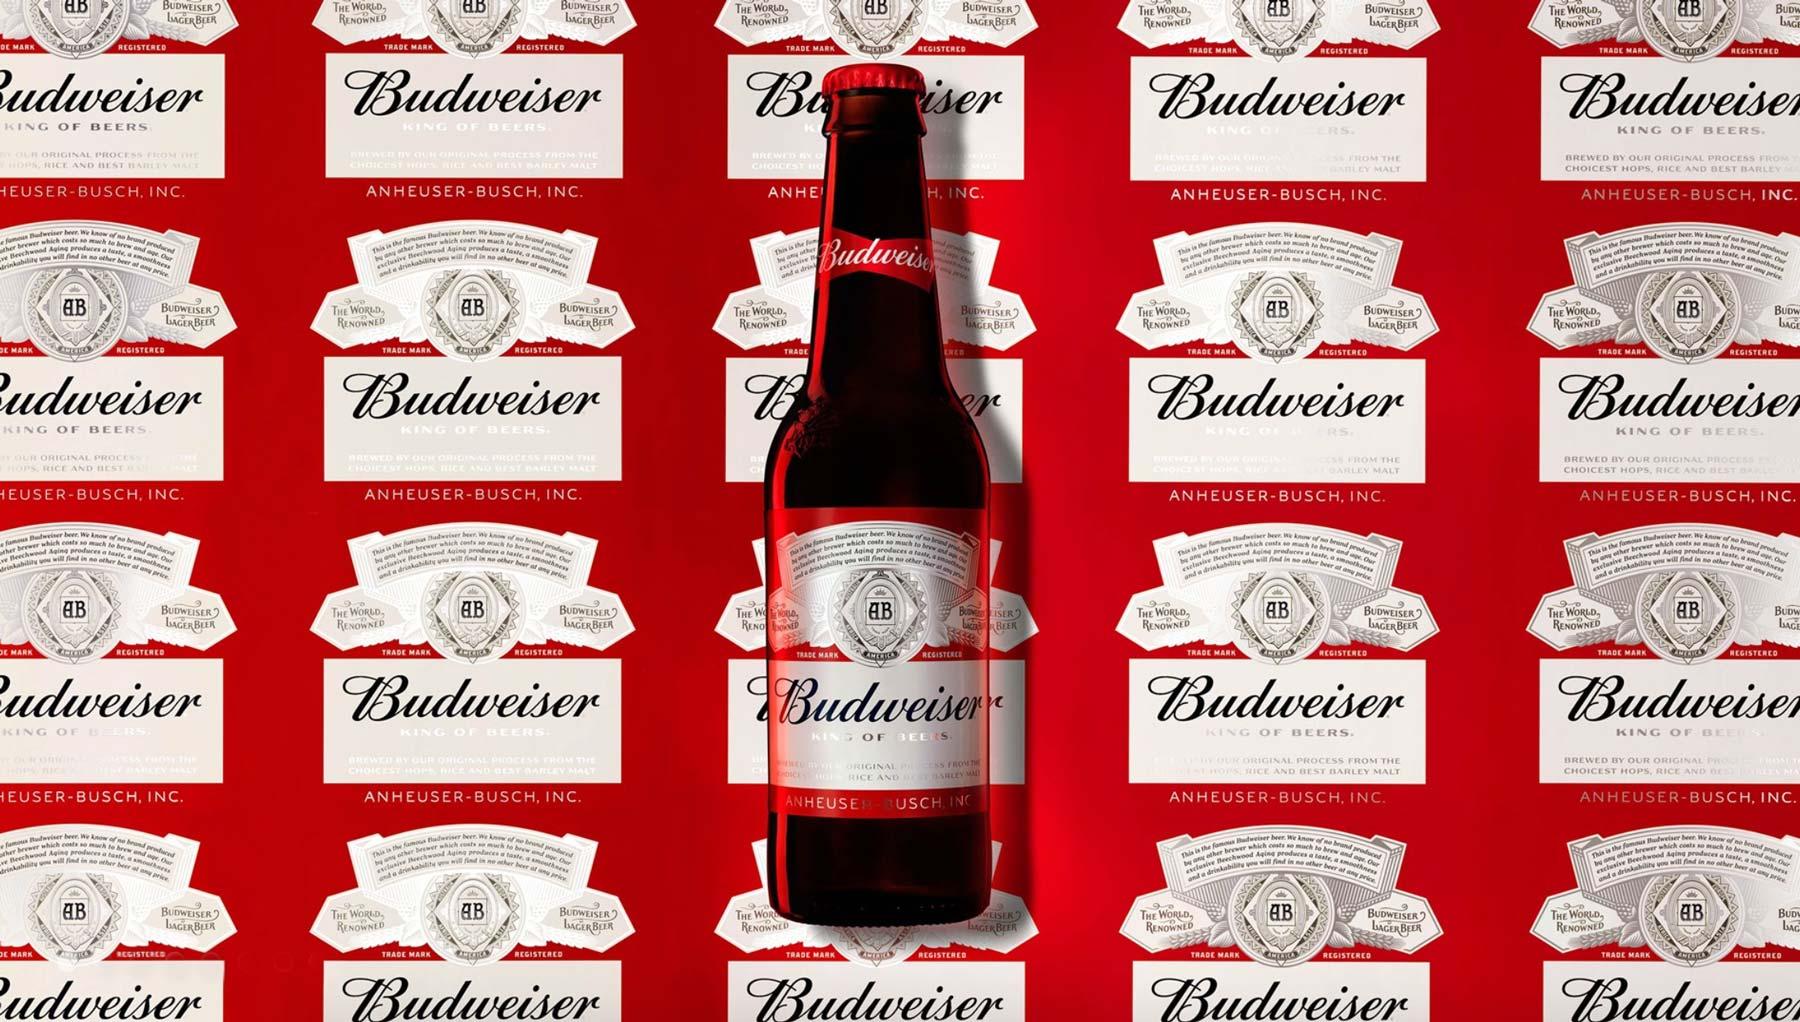 Beer & Branding: Budweiser